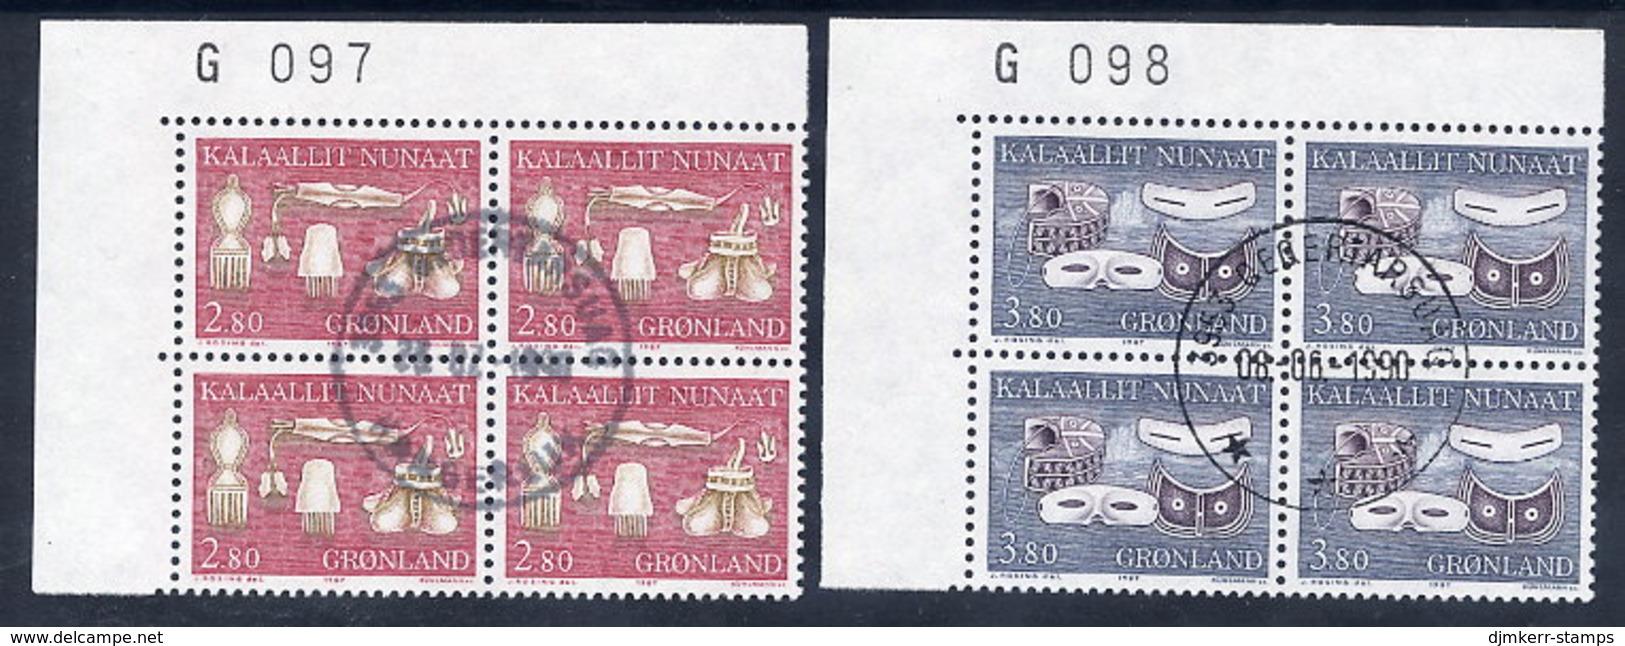 GREENLAND 1987 Cultural Artefacts II In Used Corner Blocks Of 4.  Michel 174-75 - Greenland